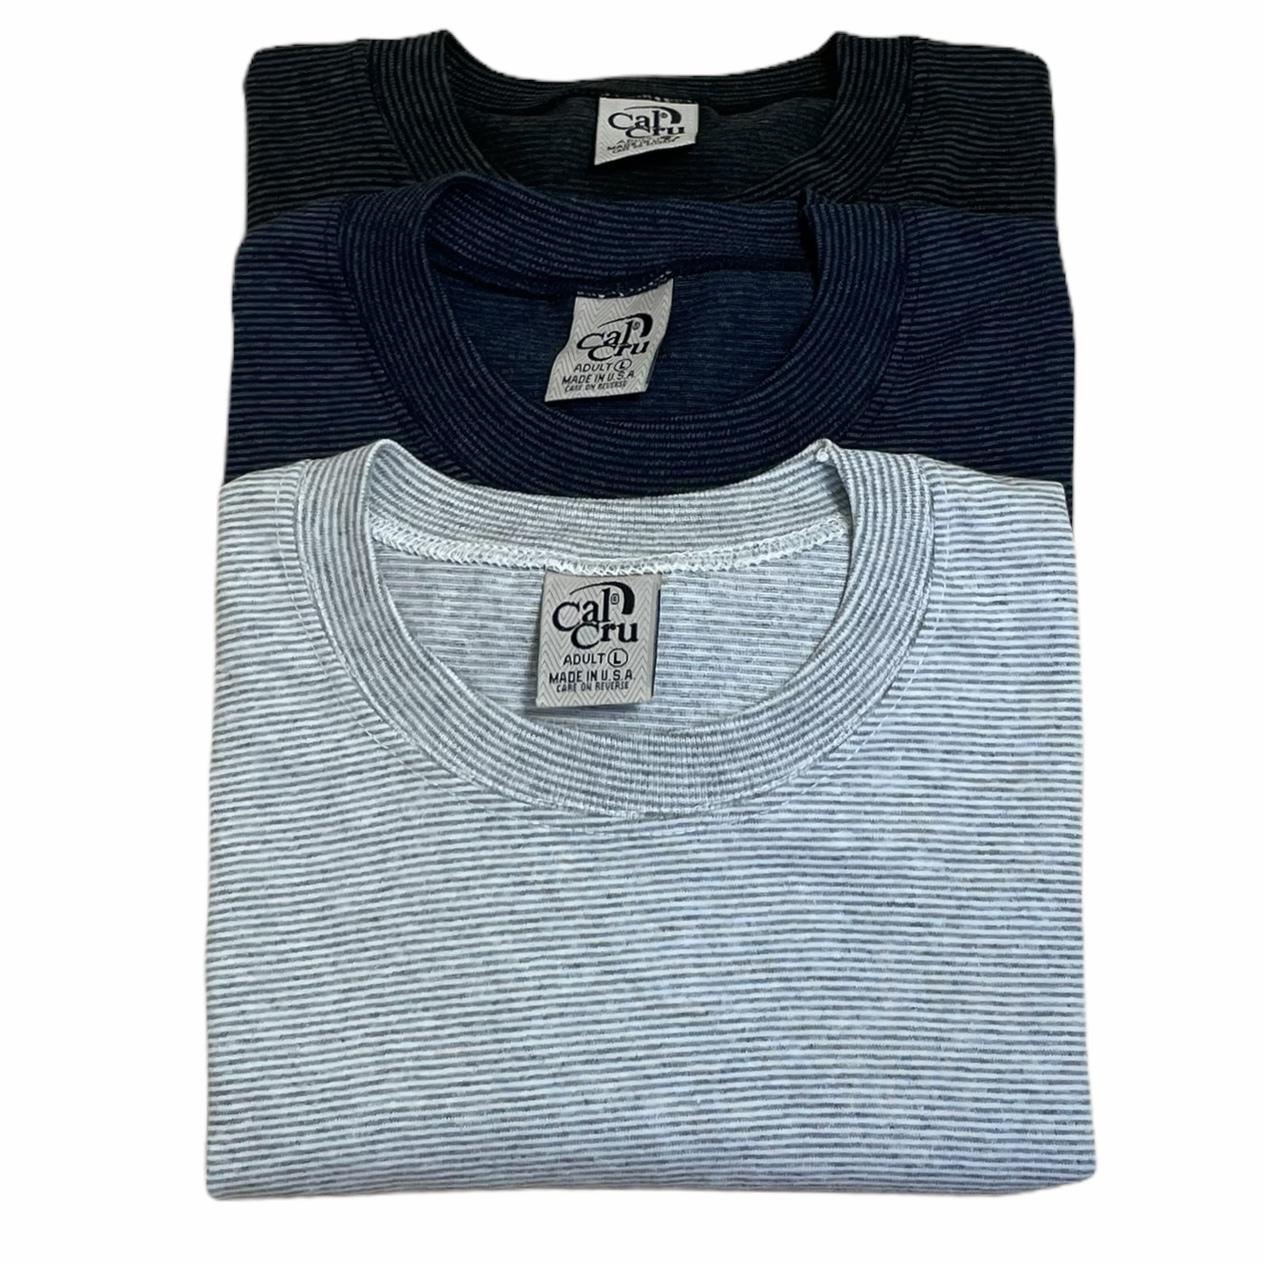 CalCru MICRO BORDER T-Shirt S/S made in USA